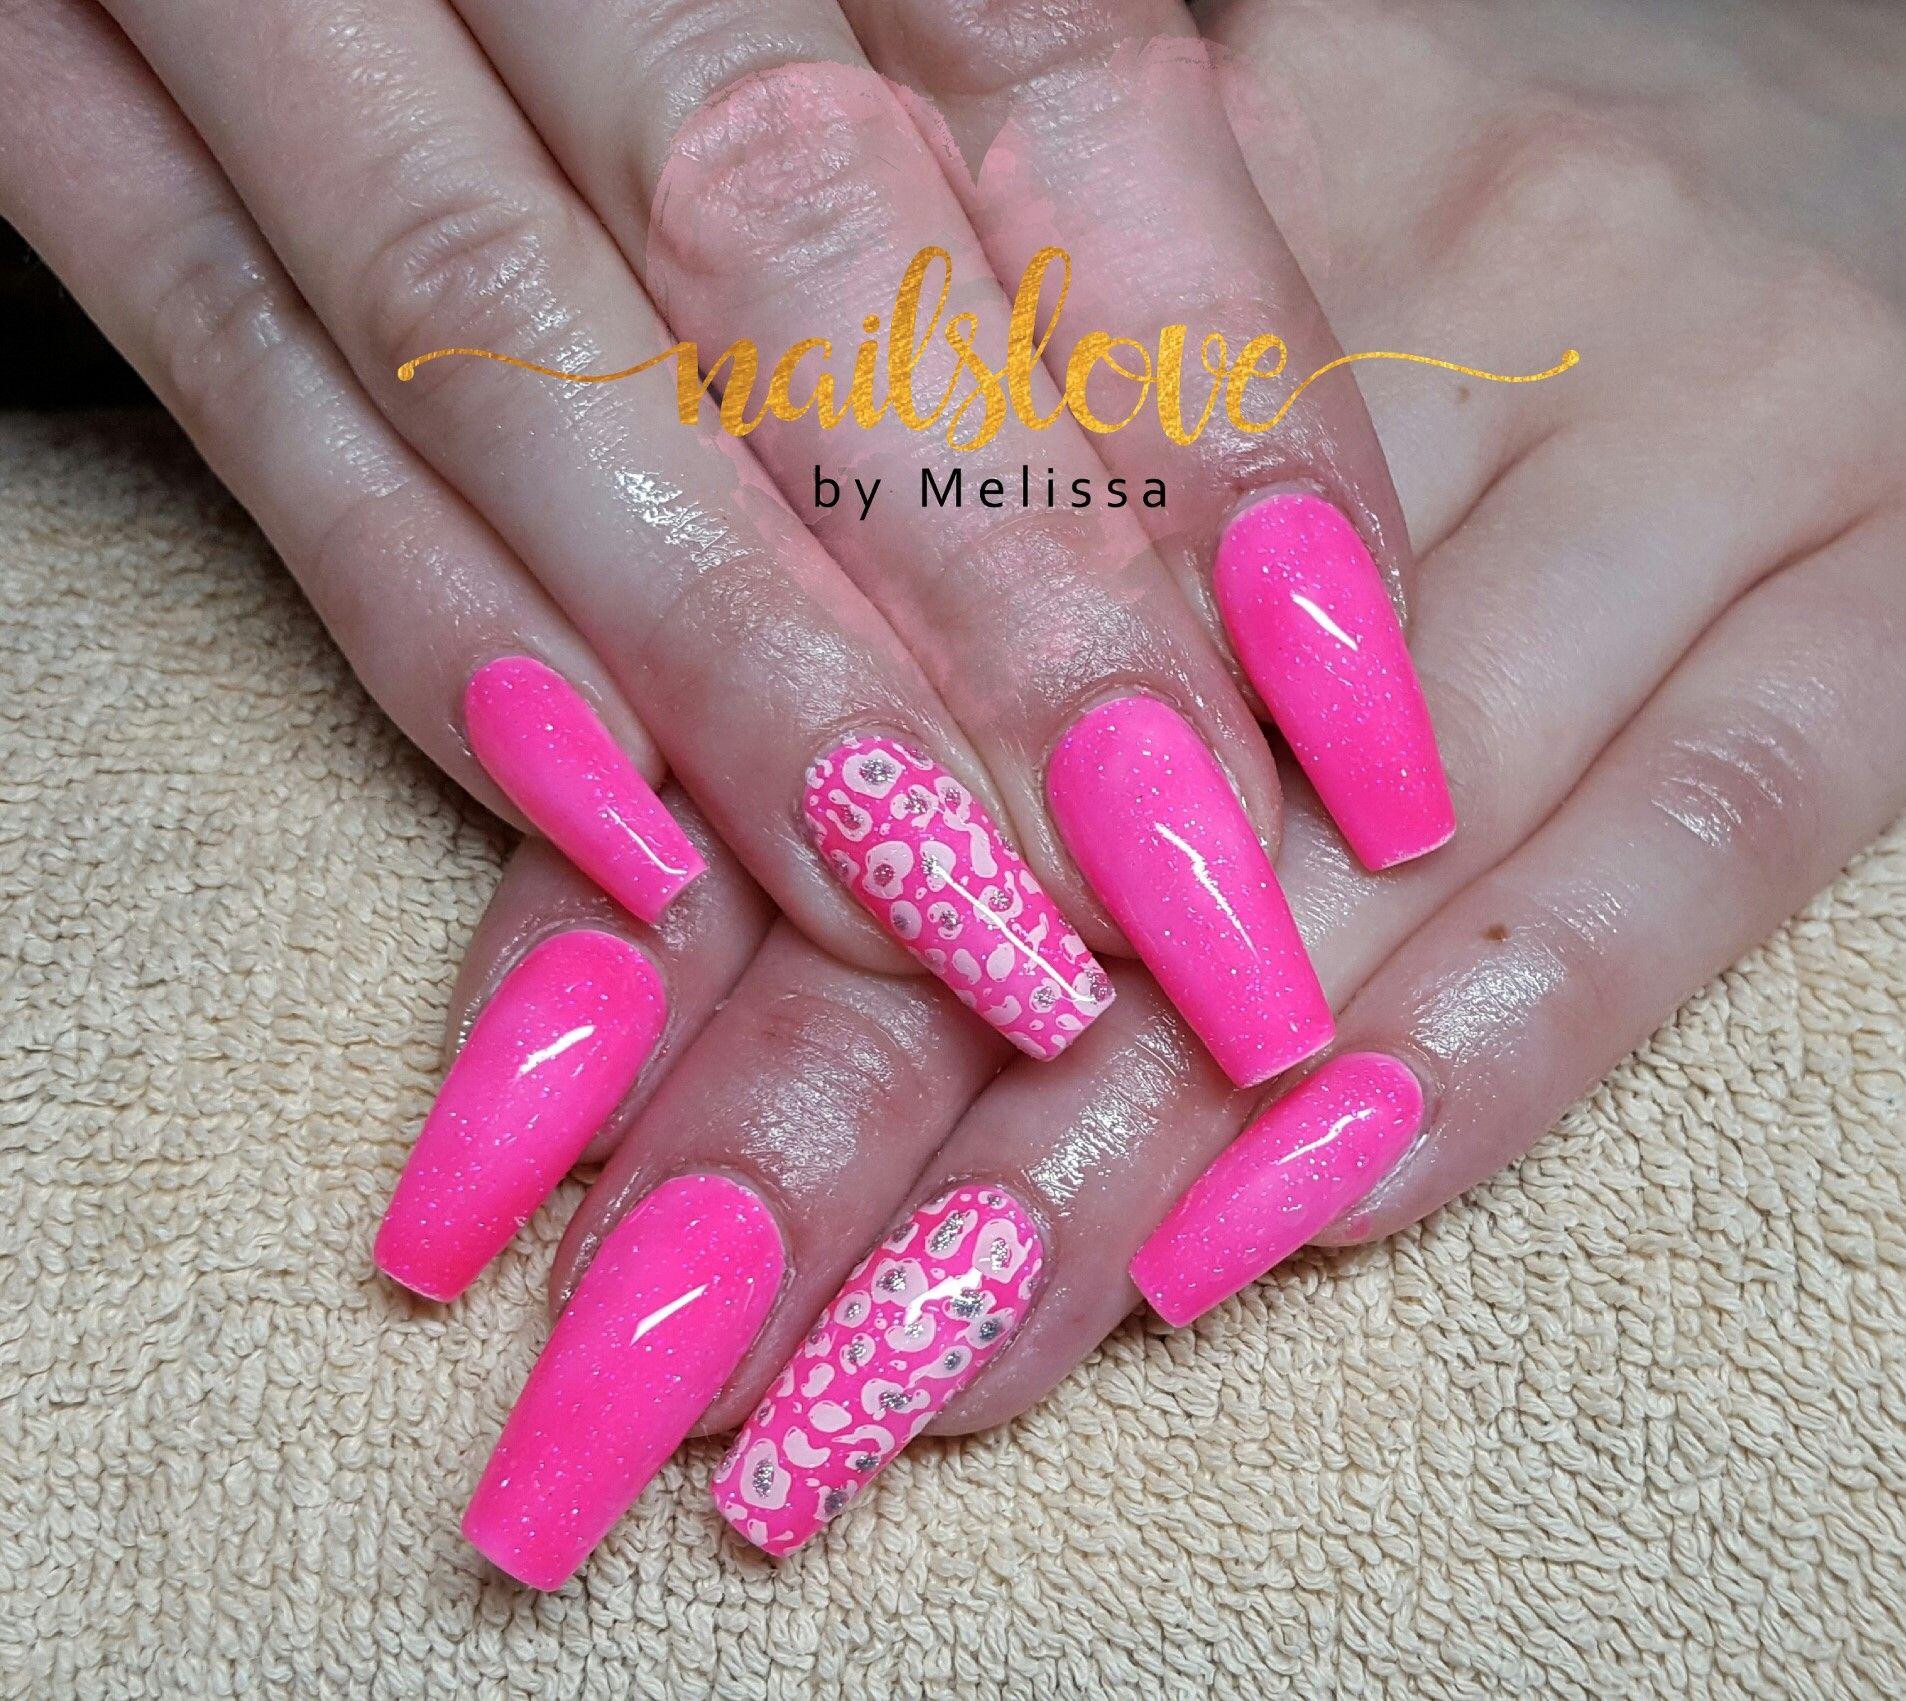 neon #neonpink #nails #nailart #pink #pinknails #nailslovebymelissa ...